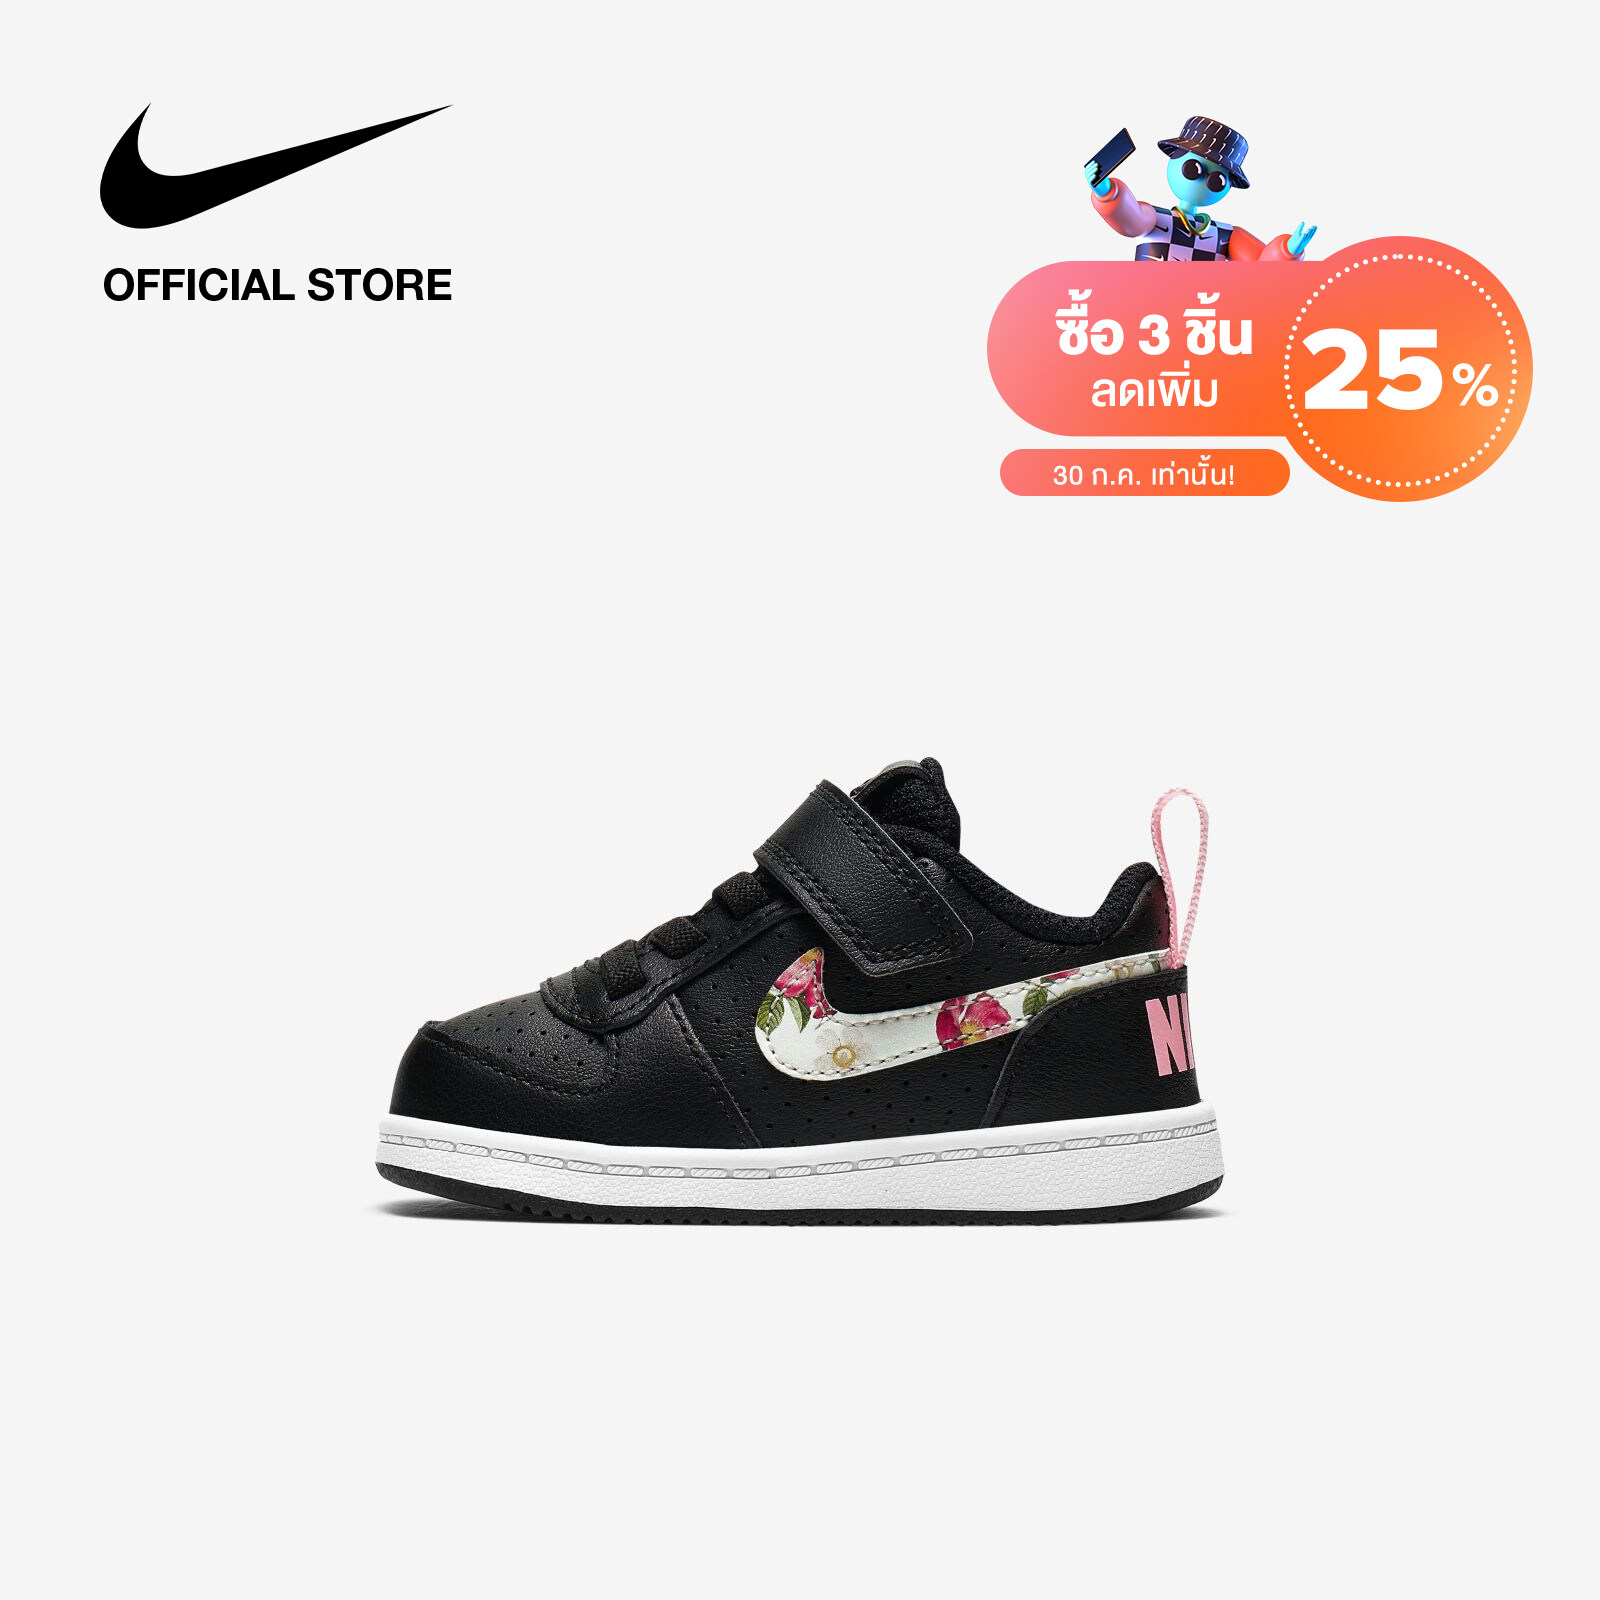 Nike Kids Court Borough Low 2 Shoes - Black ไนกี้ รองเท้าเด็ก คอร์ท โบโร่ โลว์ 2 - สีดำ.